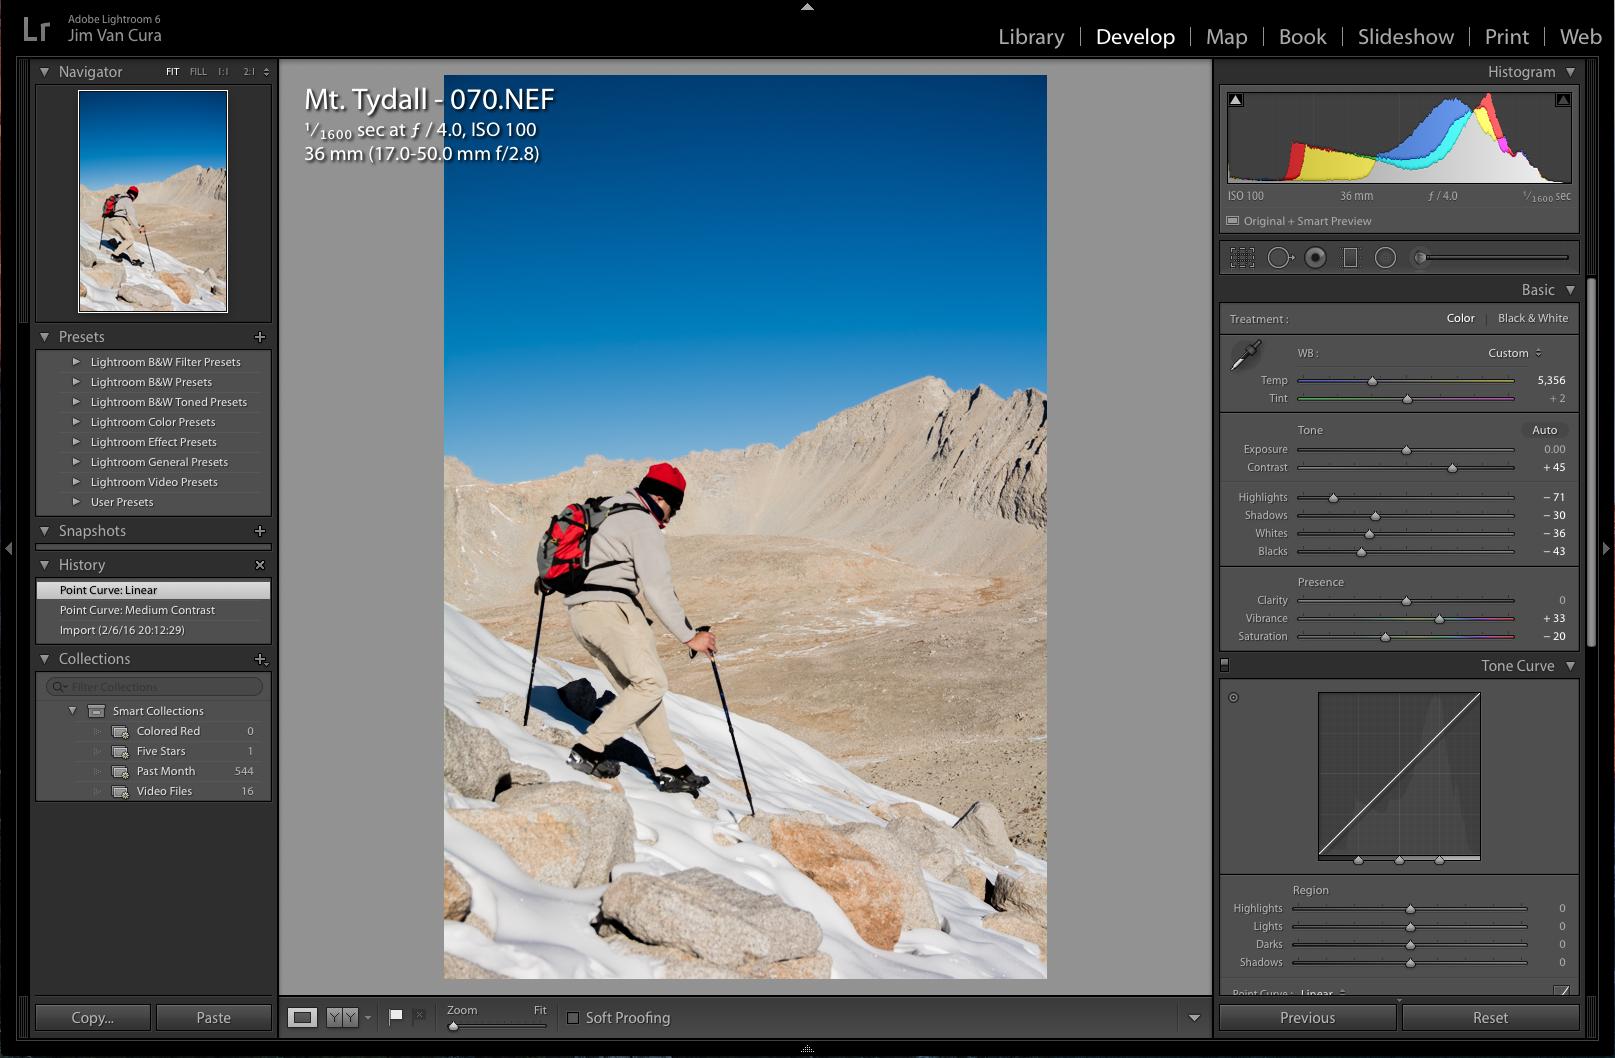 Image Processing Screen